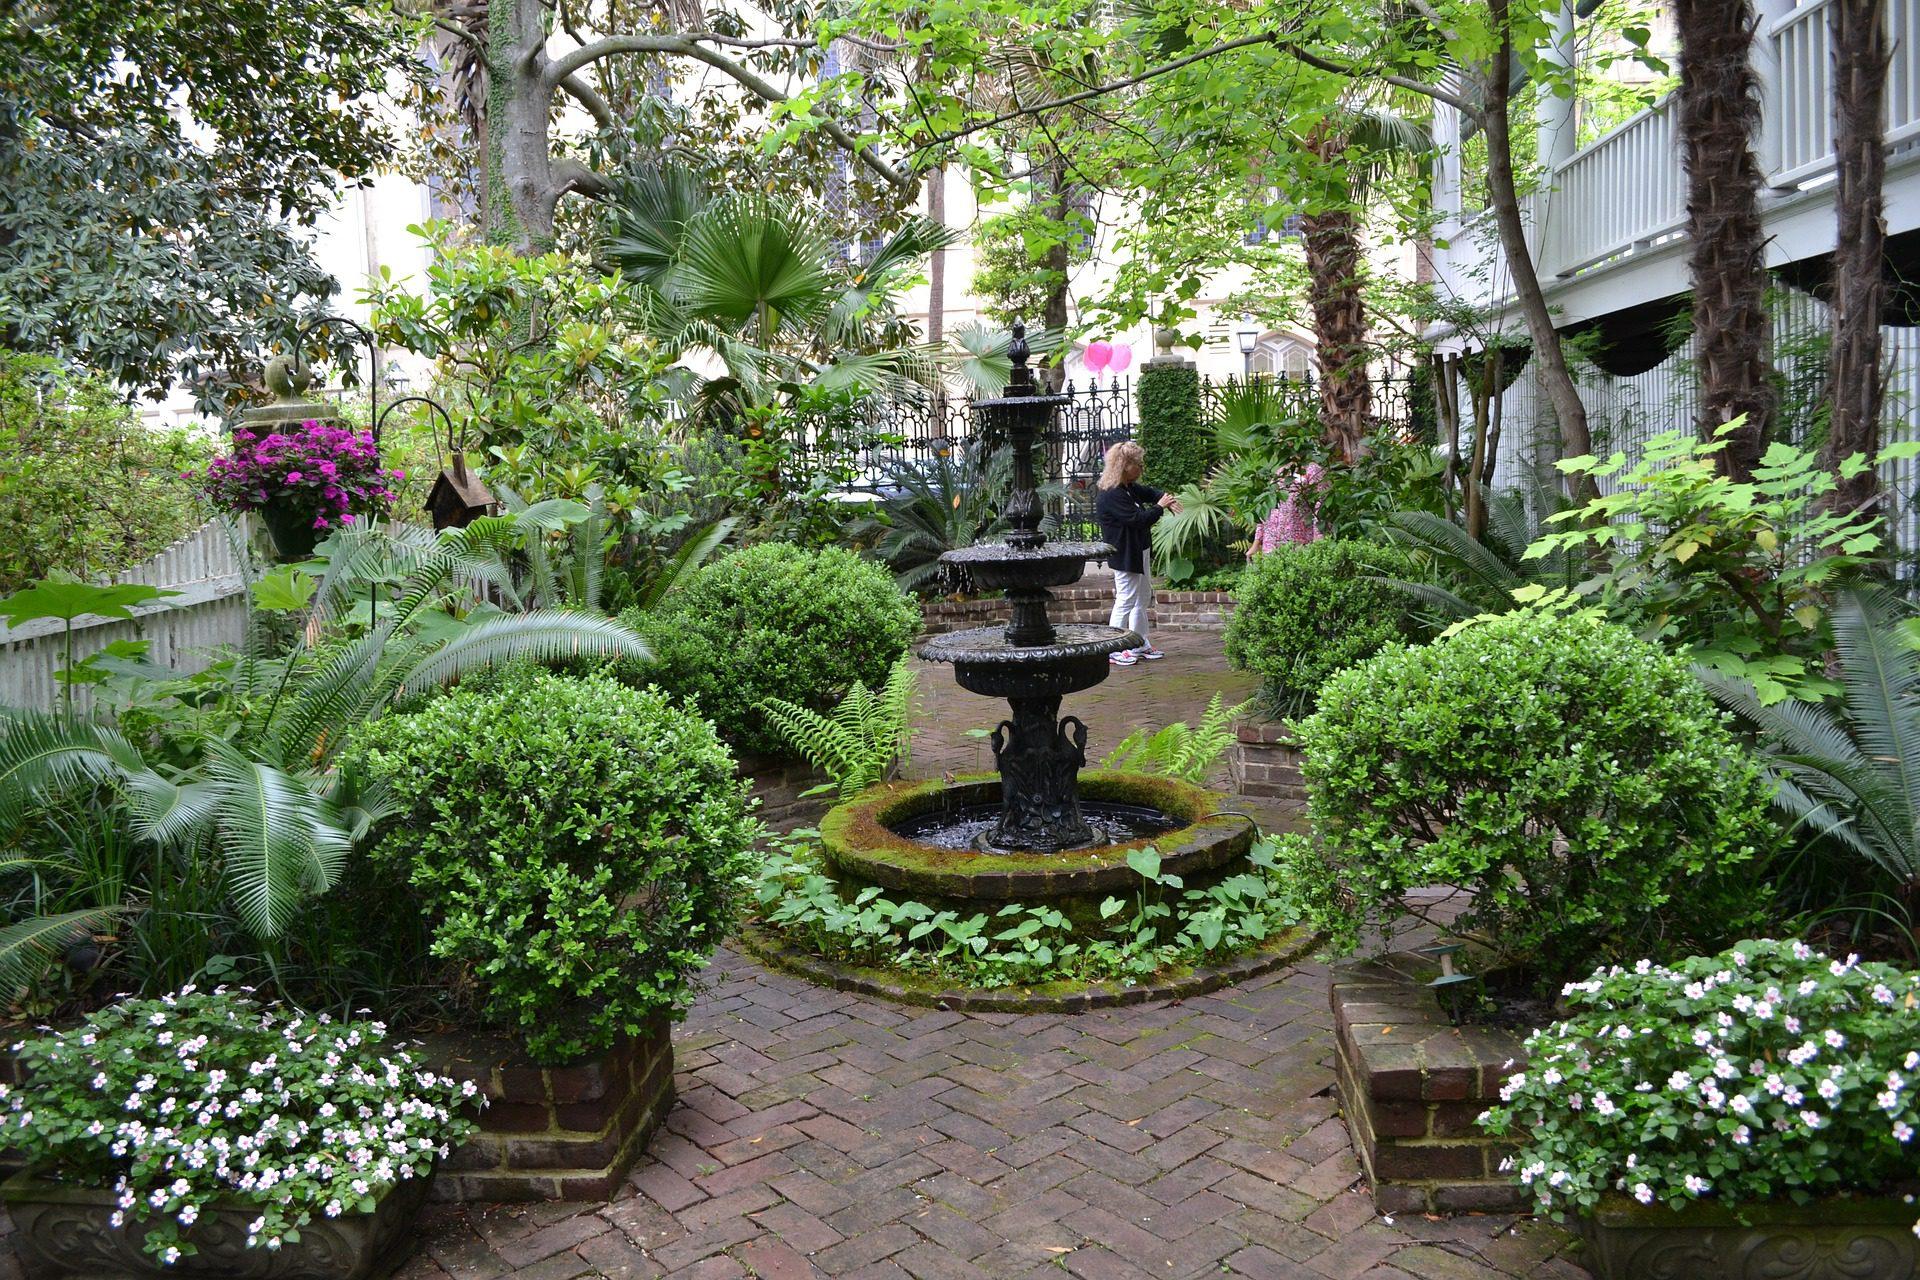 Savannah Garden, Savannah, Georgia